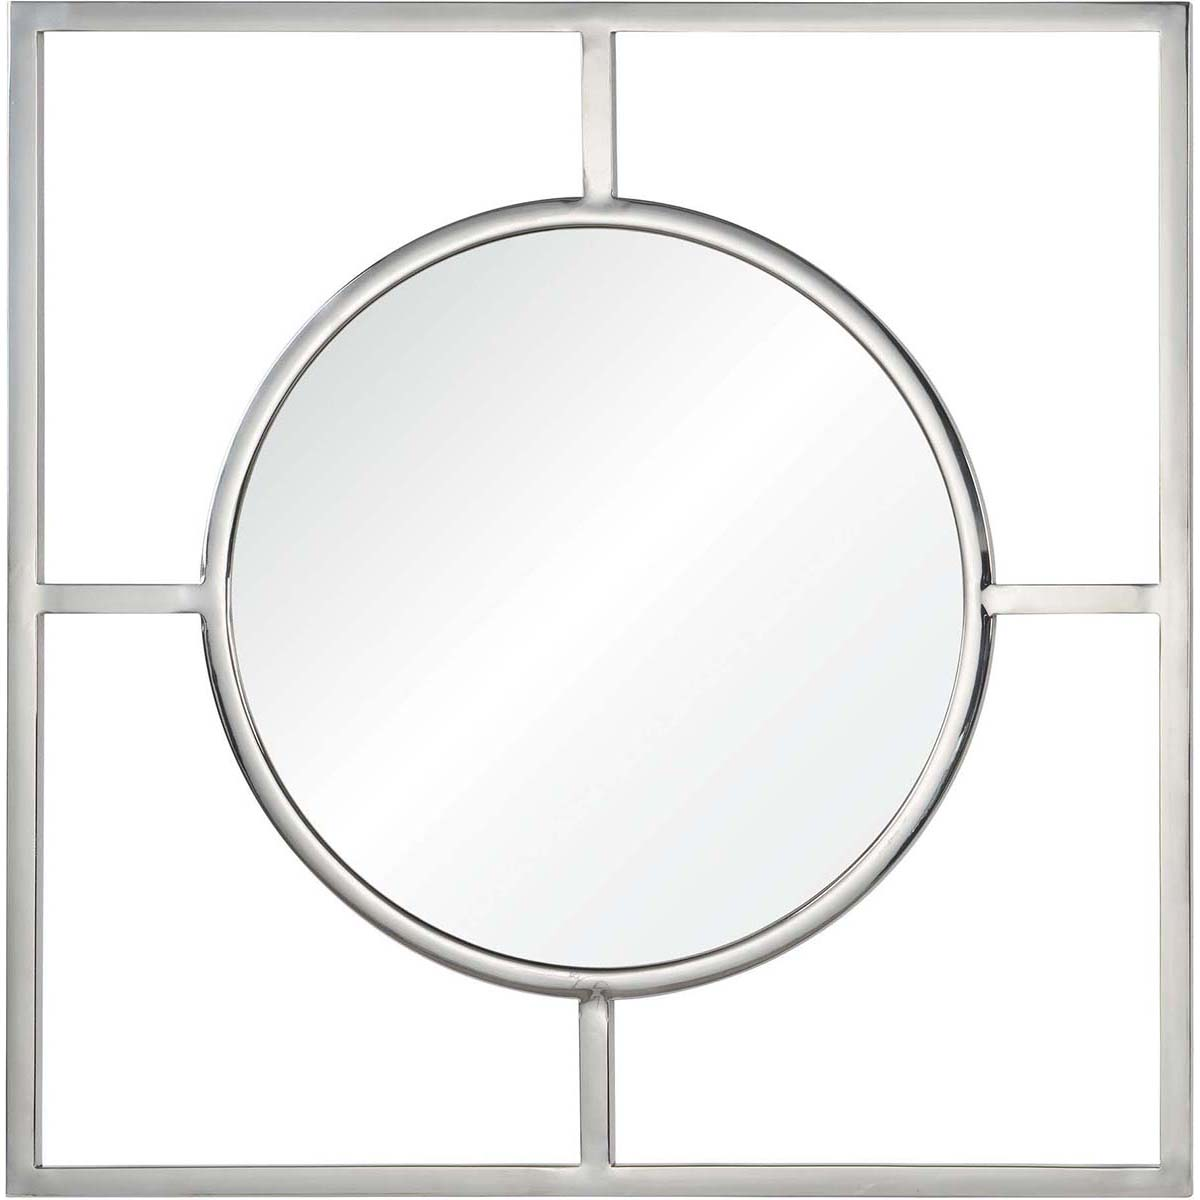 Renwill Mt1595 Severn Mirror, Chrome Finish MT1595